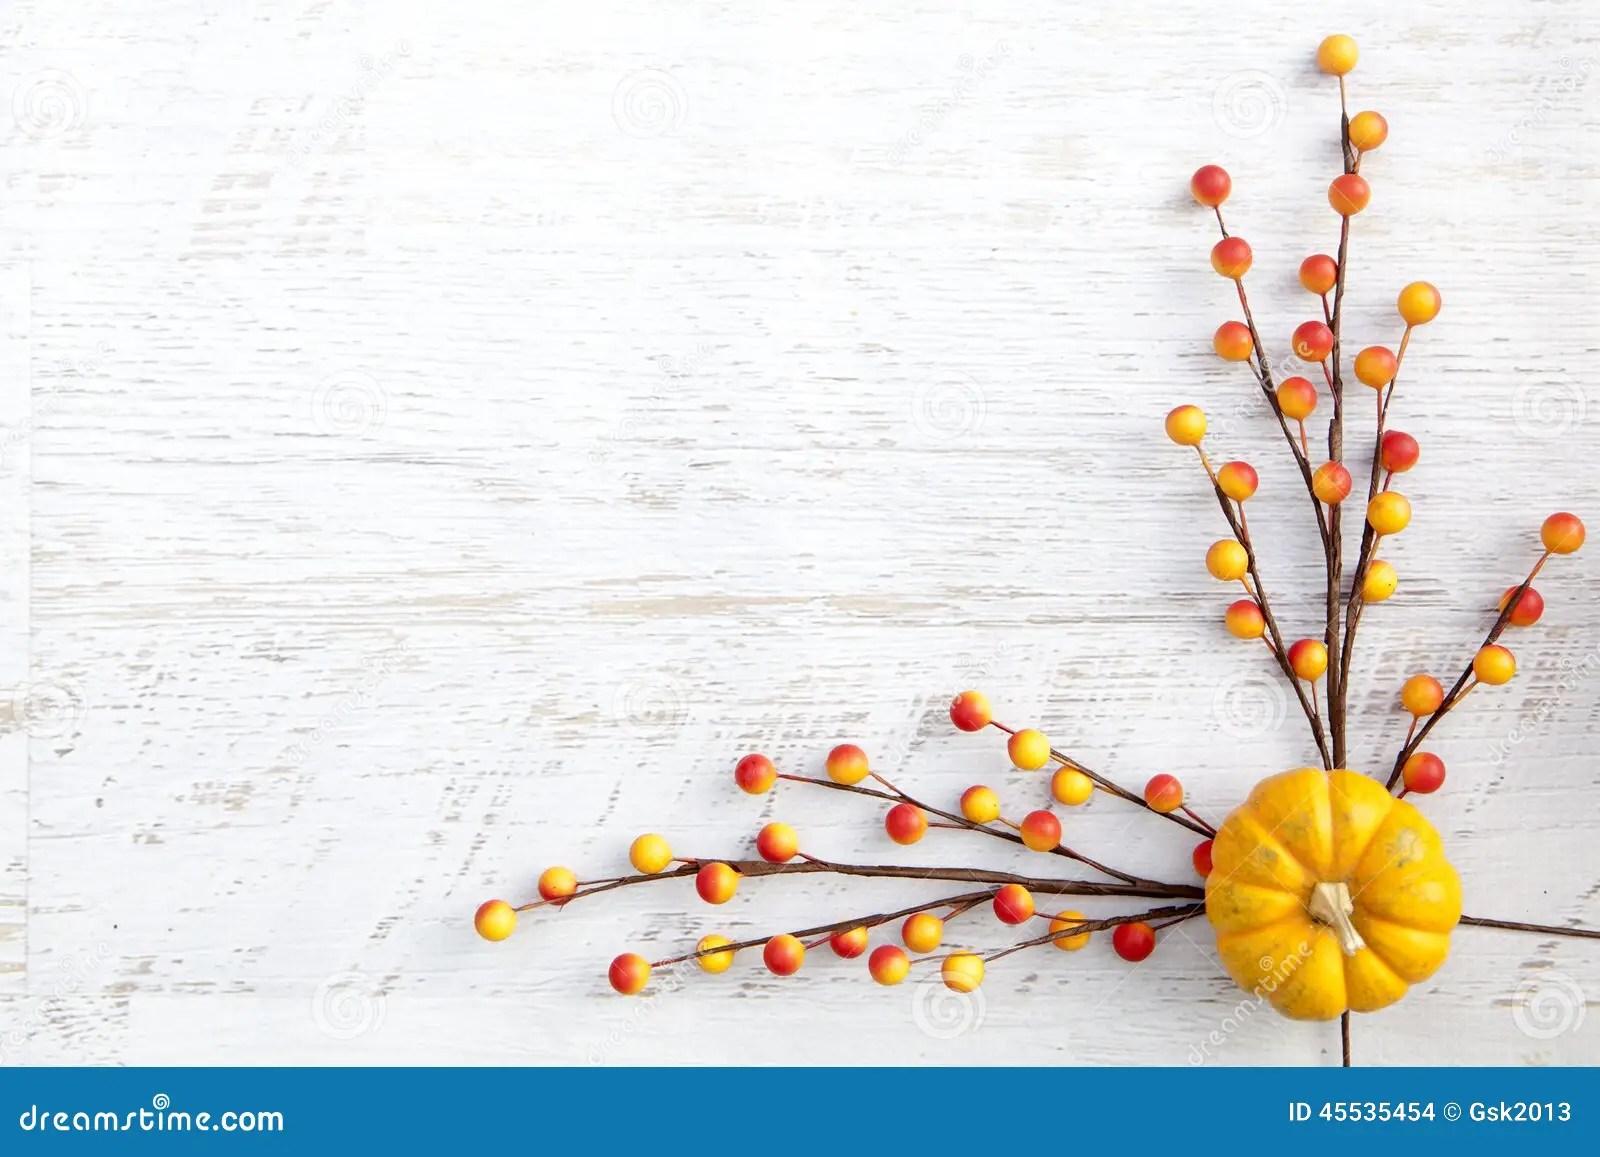 Fall Pumpkin Desktop Wallpaper Free Autumn Thanksgiving Background Stock Photo Image 45535454